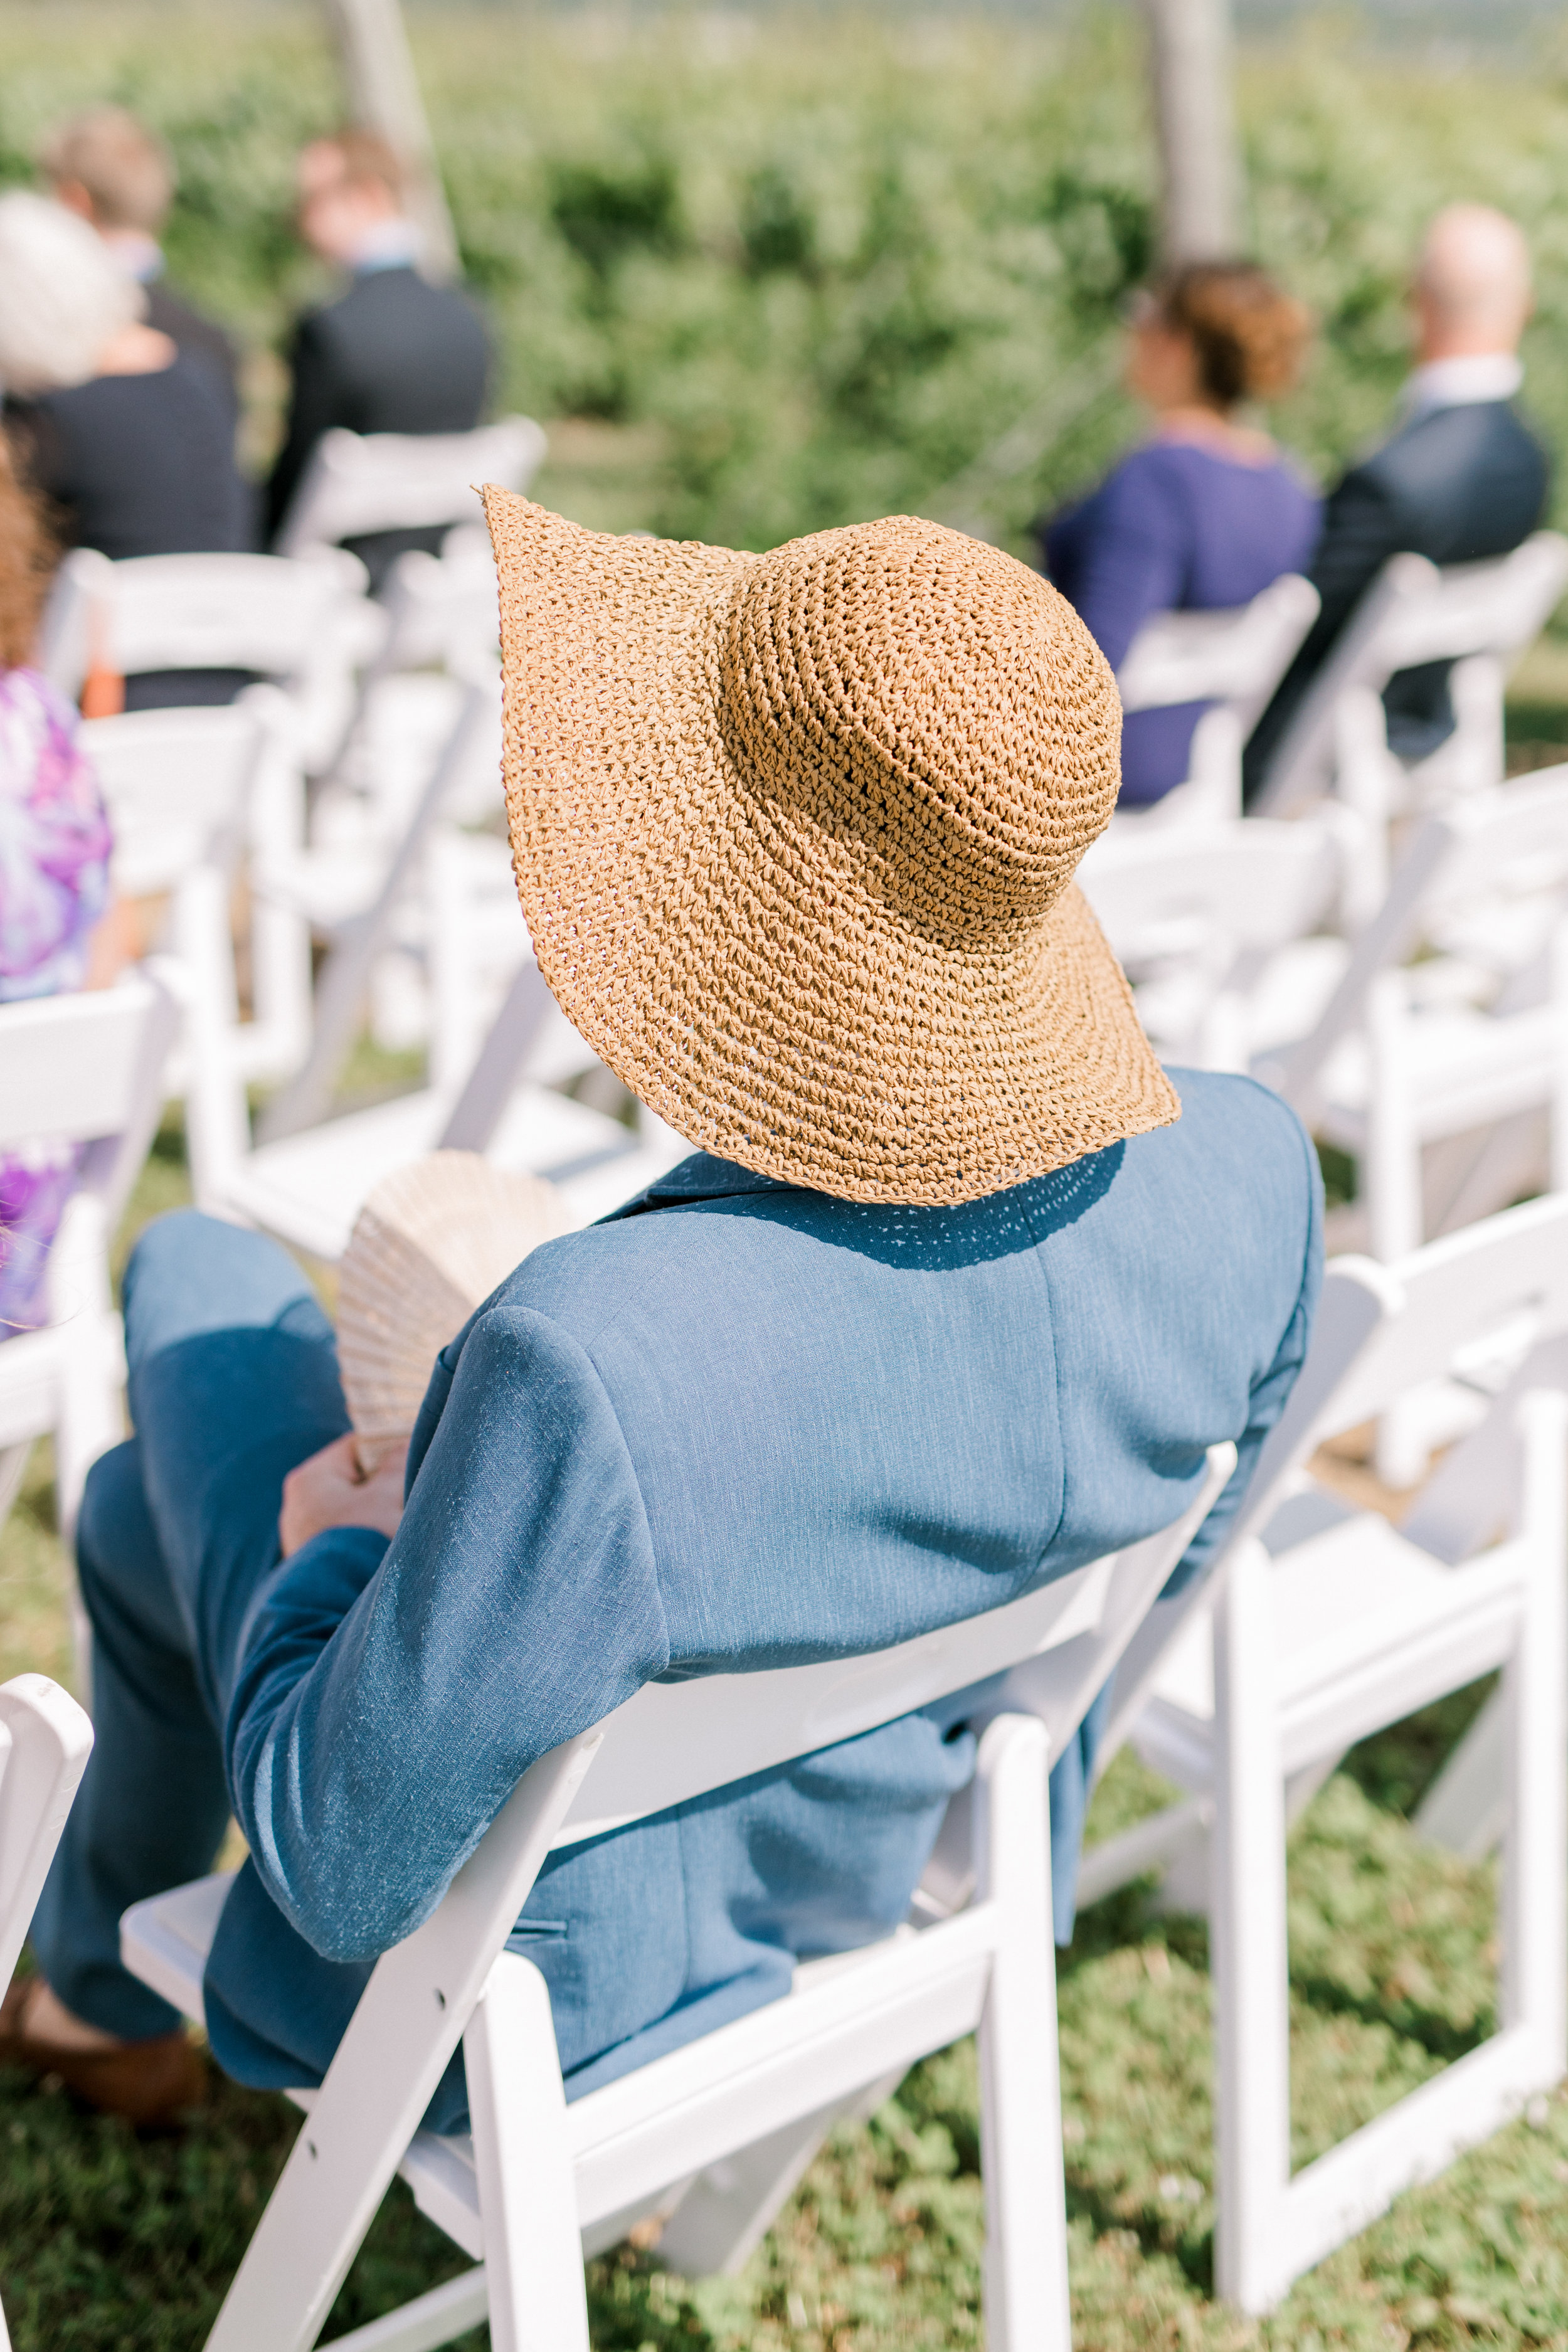 haley-richter-photography-fero-vineyards-summer-wedding-allison-and-josh-winery-pennsylvania-246.jpg